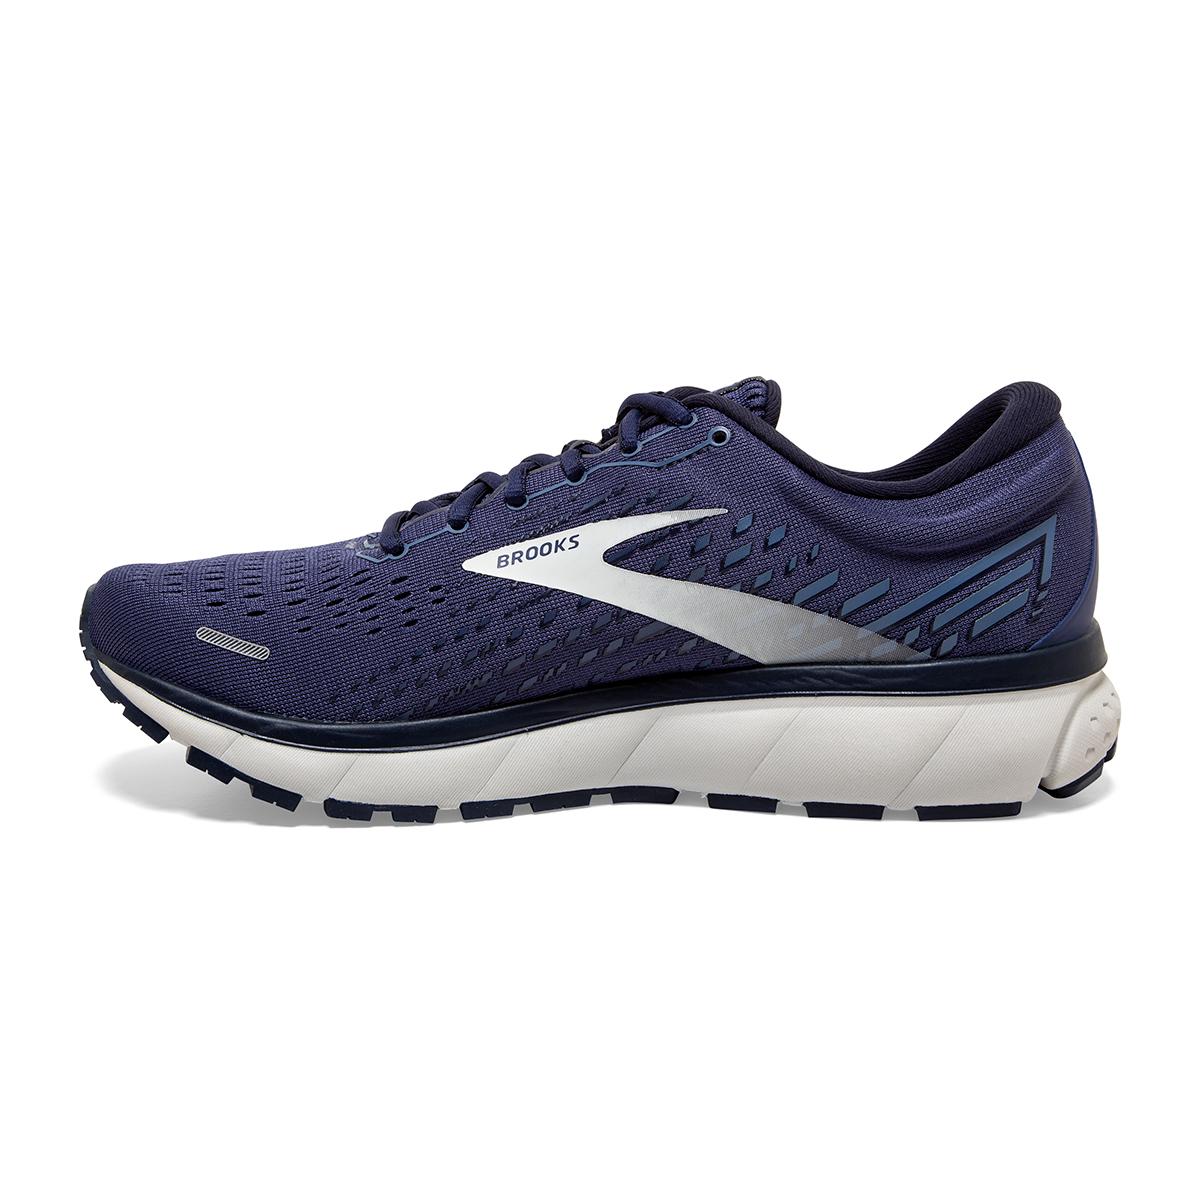 Men's Brooks Ghost 13 Running Shoe - Color: Deep Cobalt/Grey - Size: 7 - Width: Regular, Deep Cobalt/Grey, large, image 5